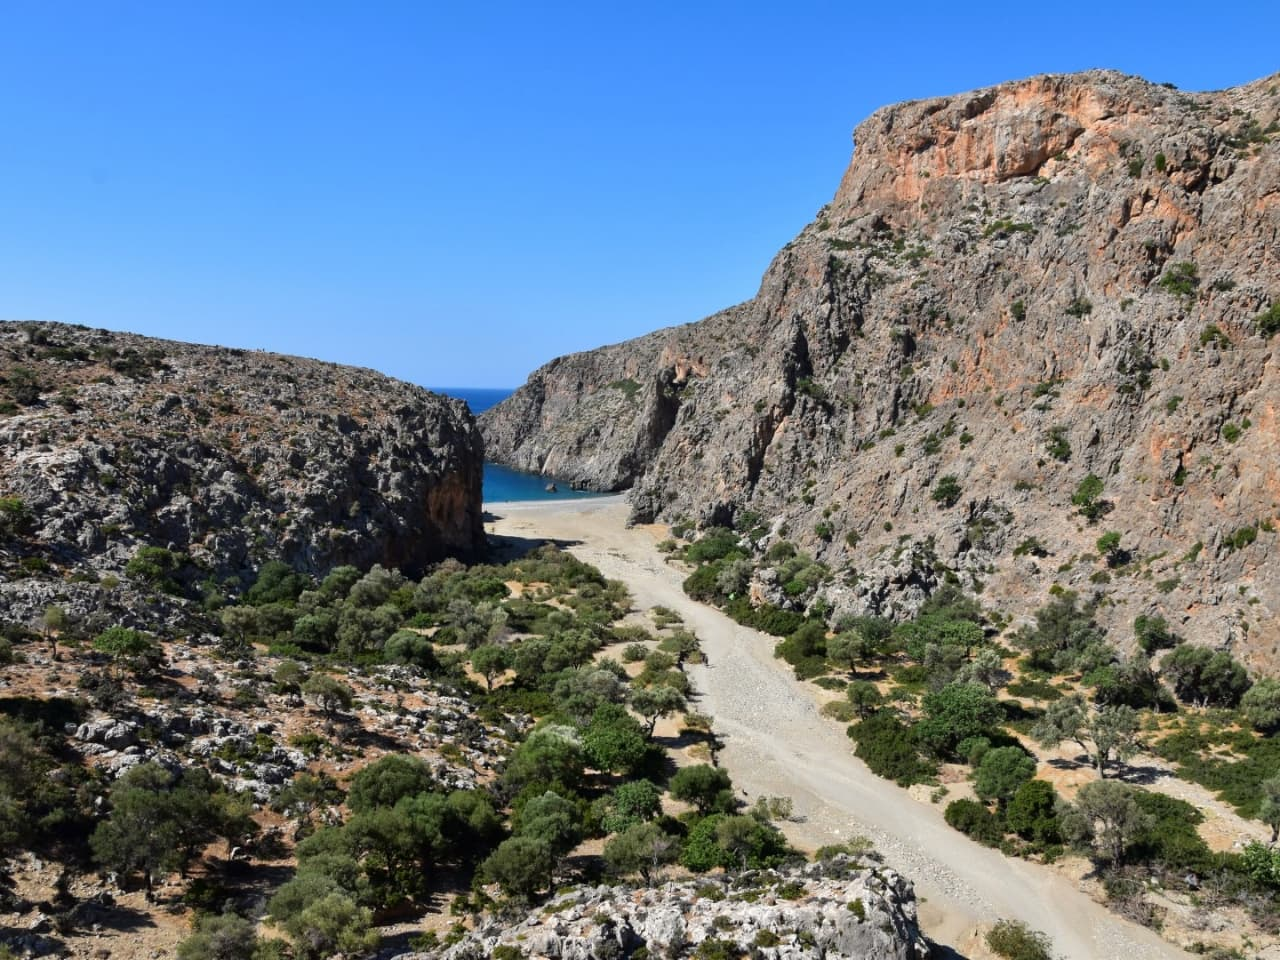 Photo Of The Day - Agiofaraggo Beach - South Heraklion, Crete